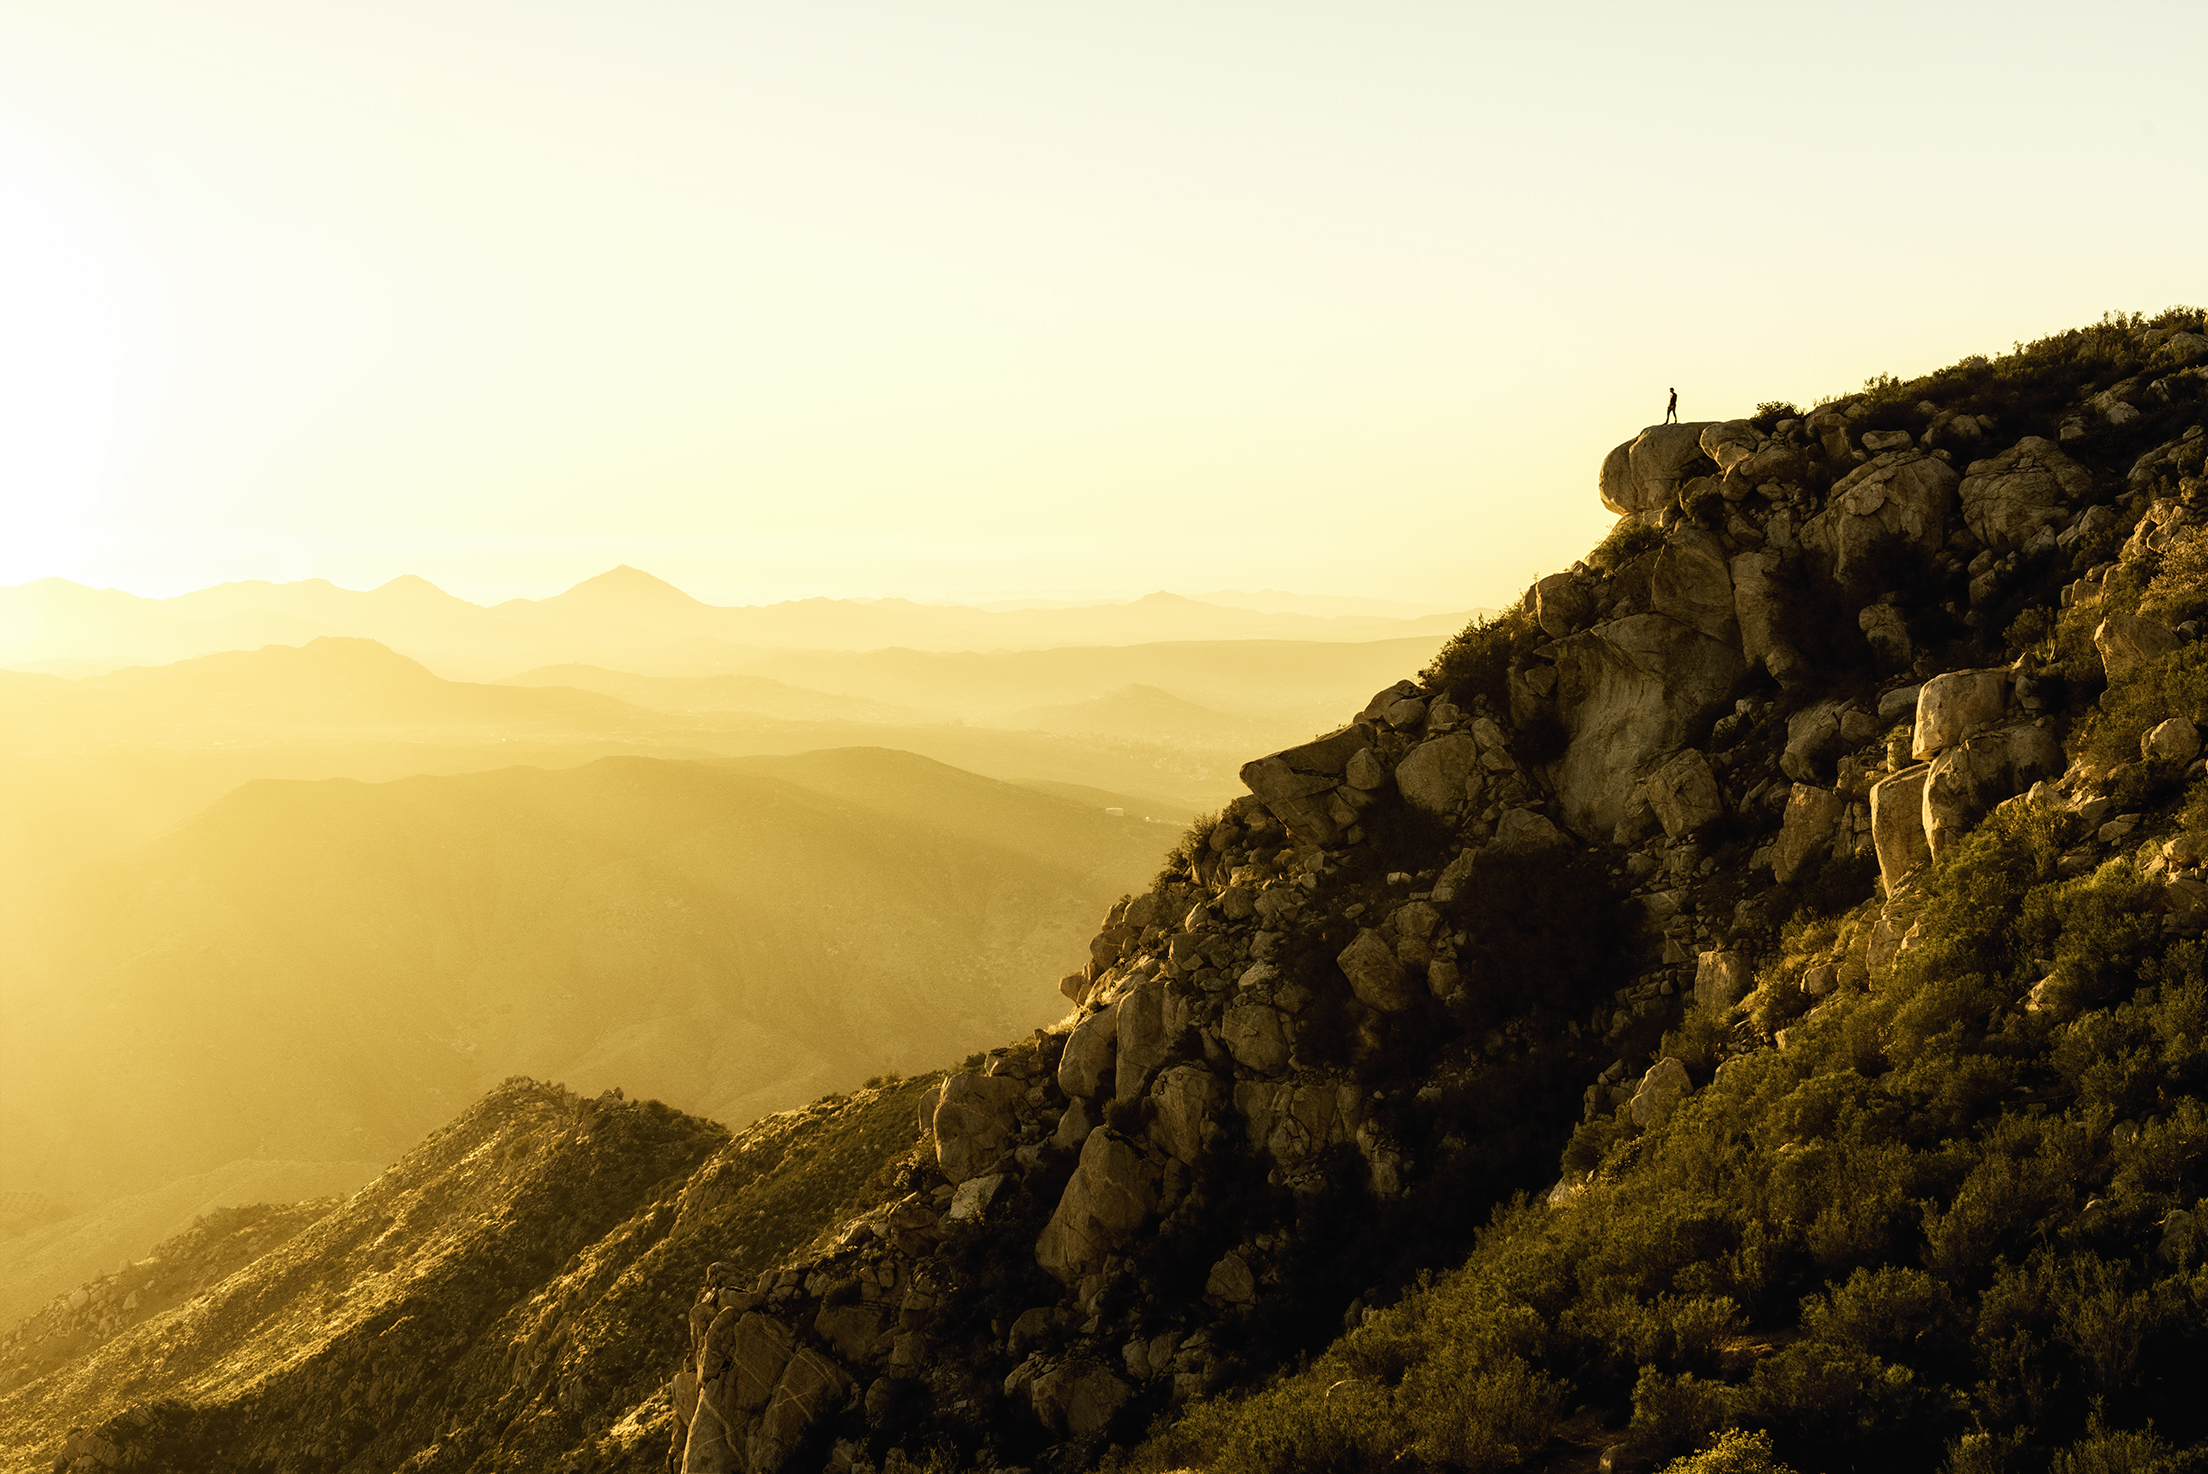 austin-trigg-southern-california-Joe-Sunset-mountains-golden-hour-desert-san-diego.jpg